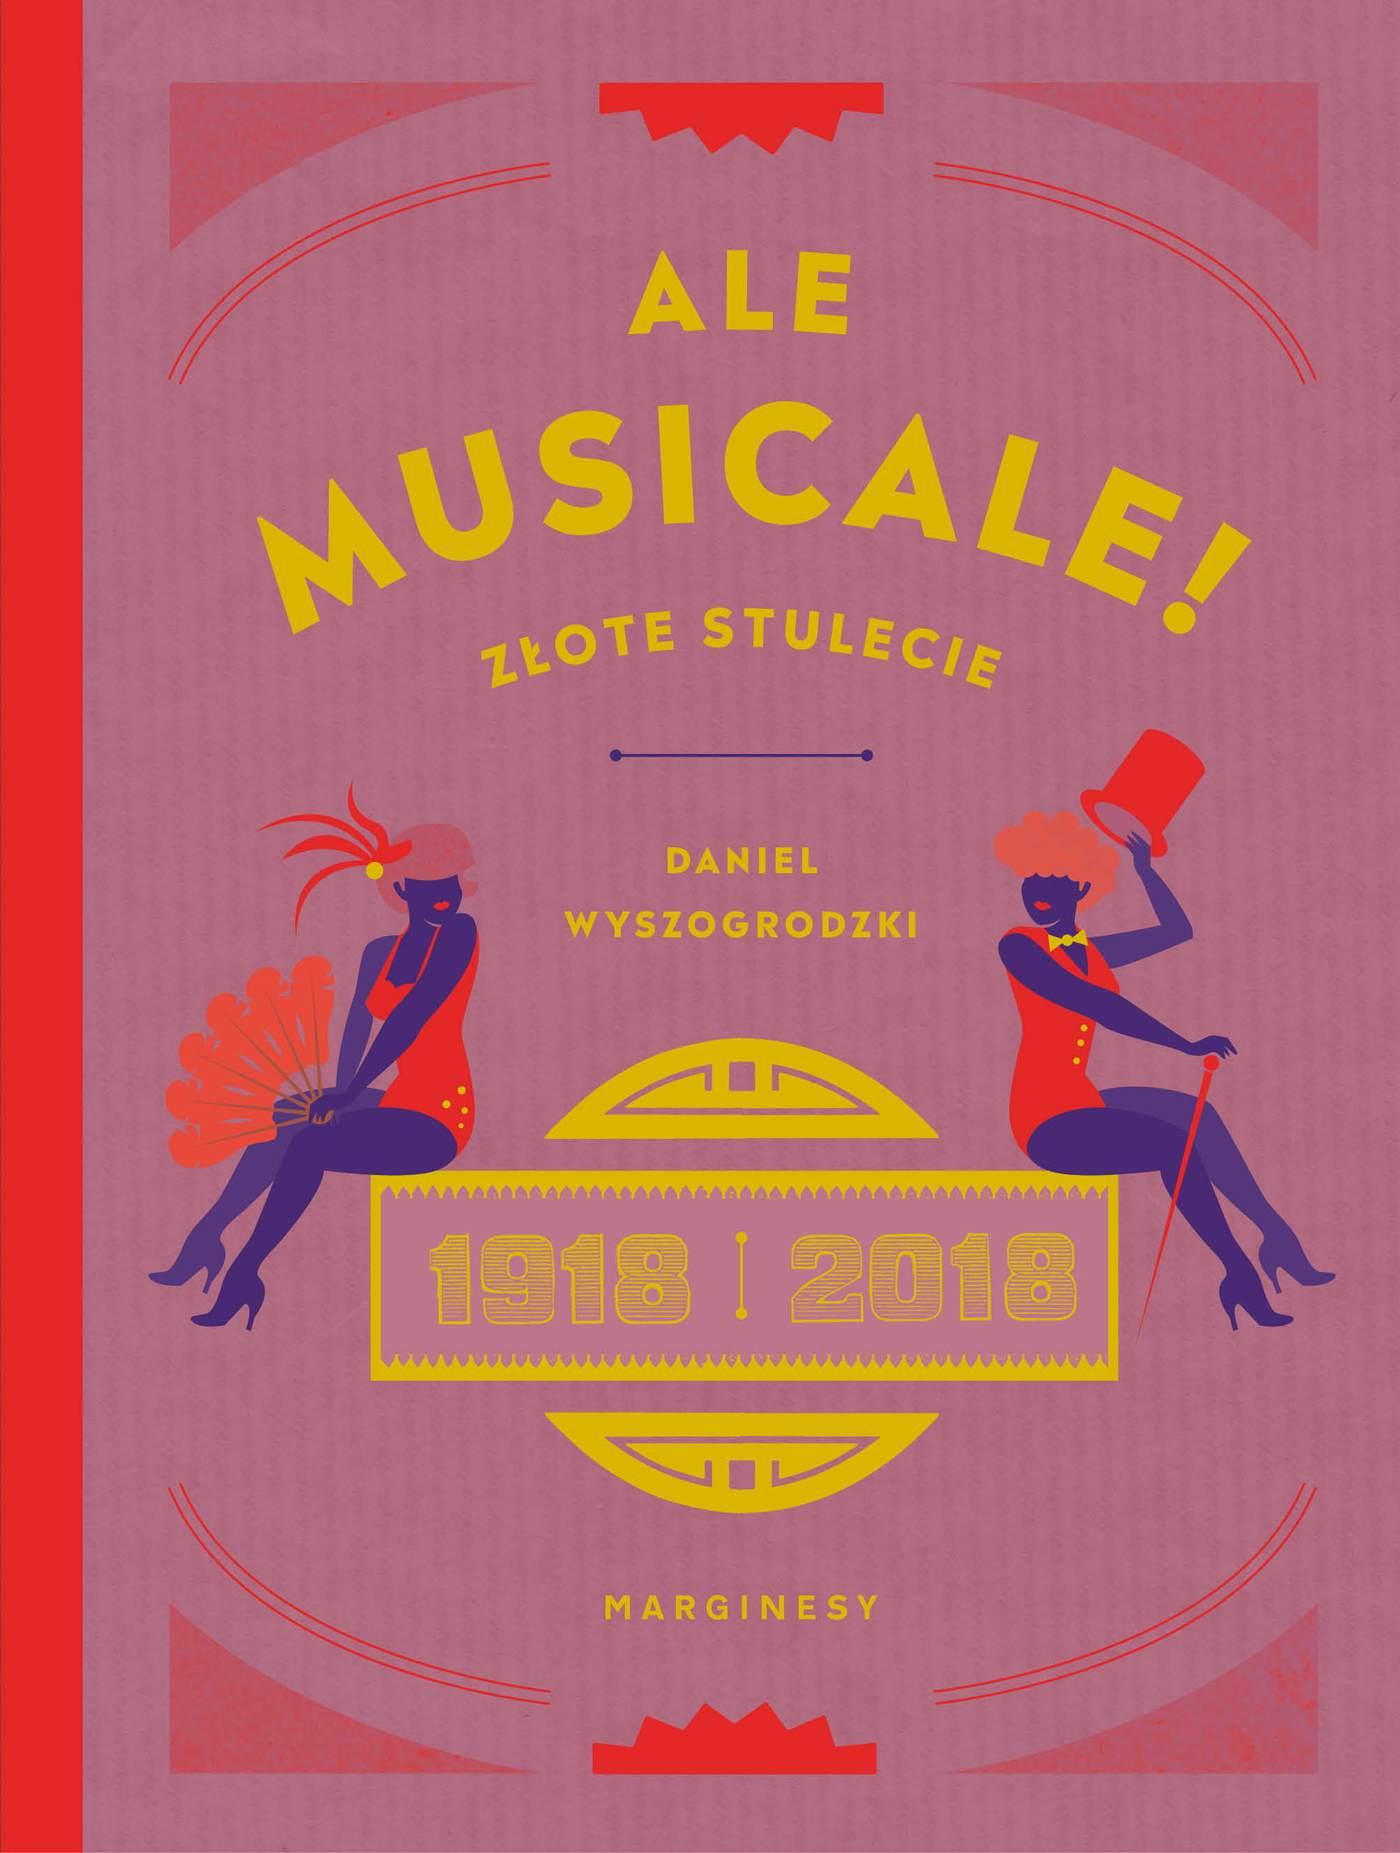 Ale musicale! - Ebook (Książka na Kindle) do pobrania w formacie MOBI